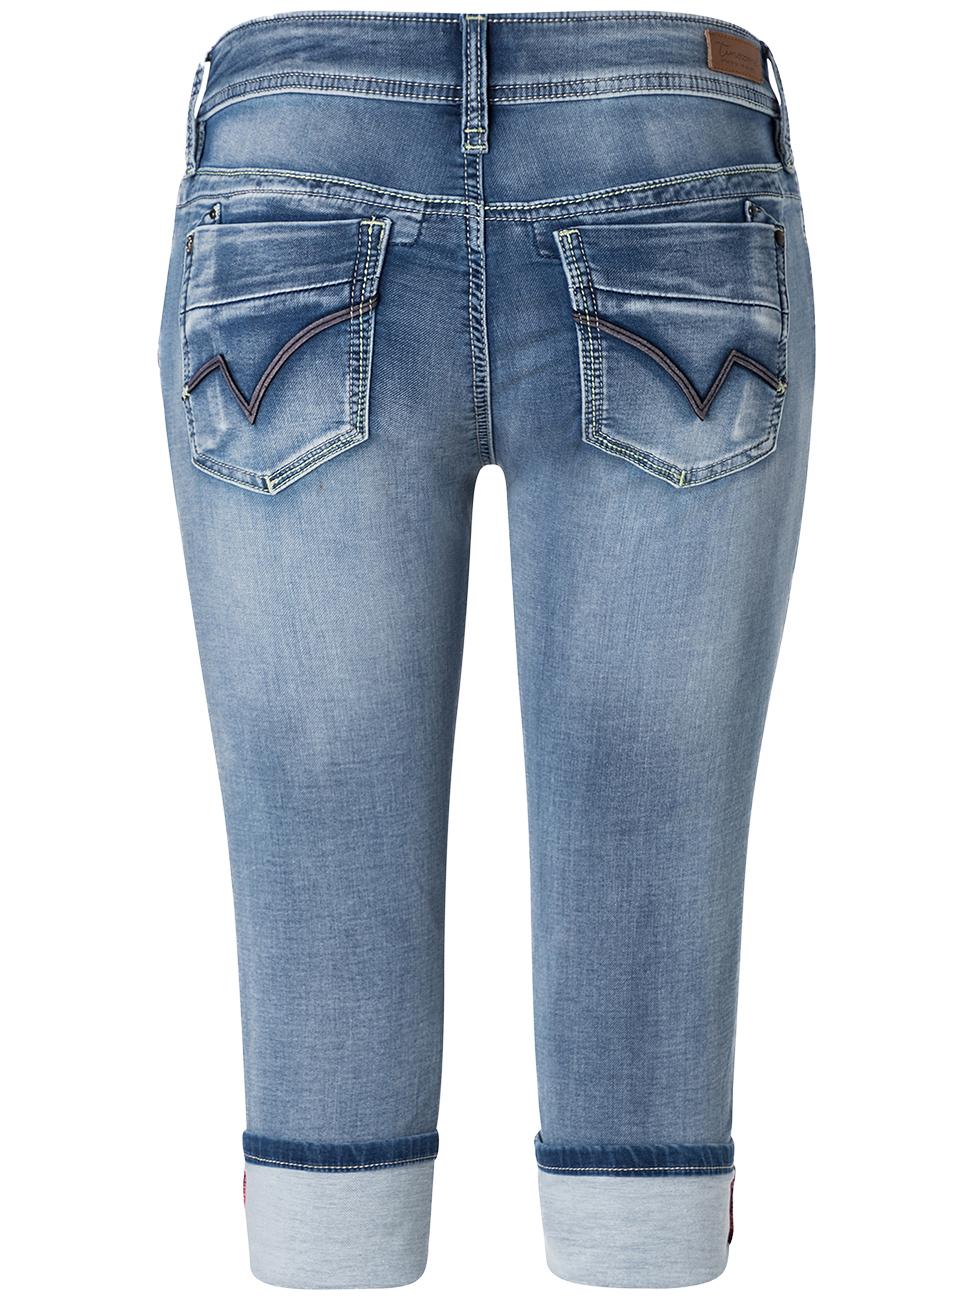 timezone-3-4-damen-jeans-tali-slim-fit-blau-aqua-blue-wash